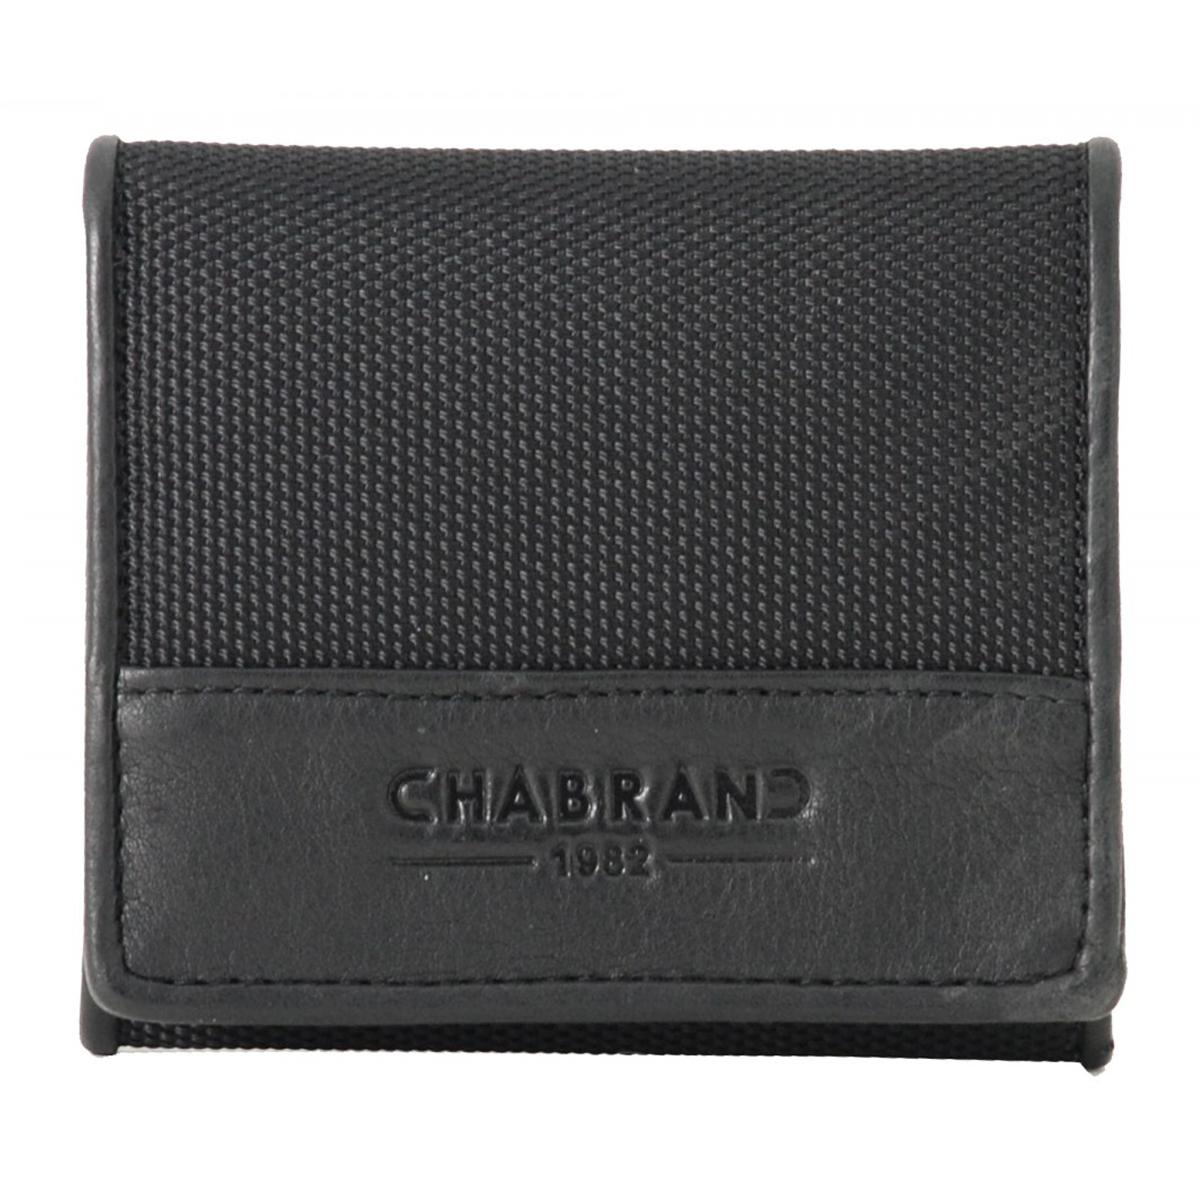 Porte-monnaie toile et cuir \'Chabrand\' noir - 10x9x3 cm - [Z0034]